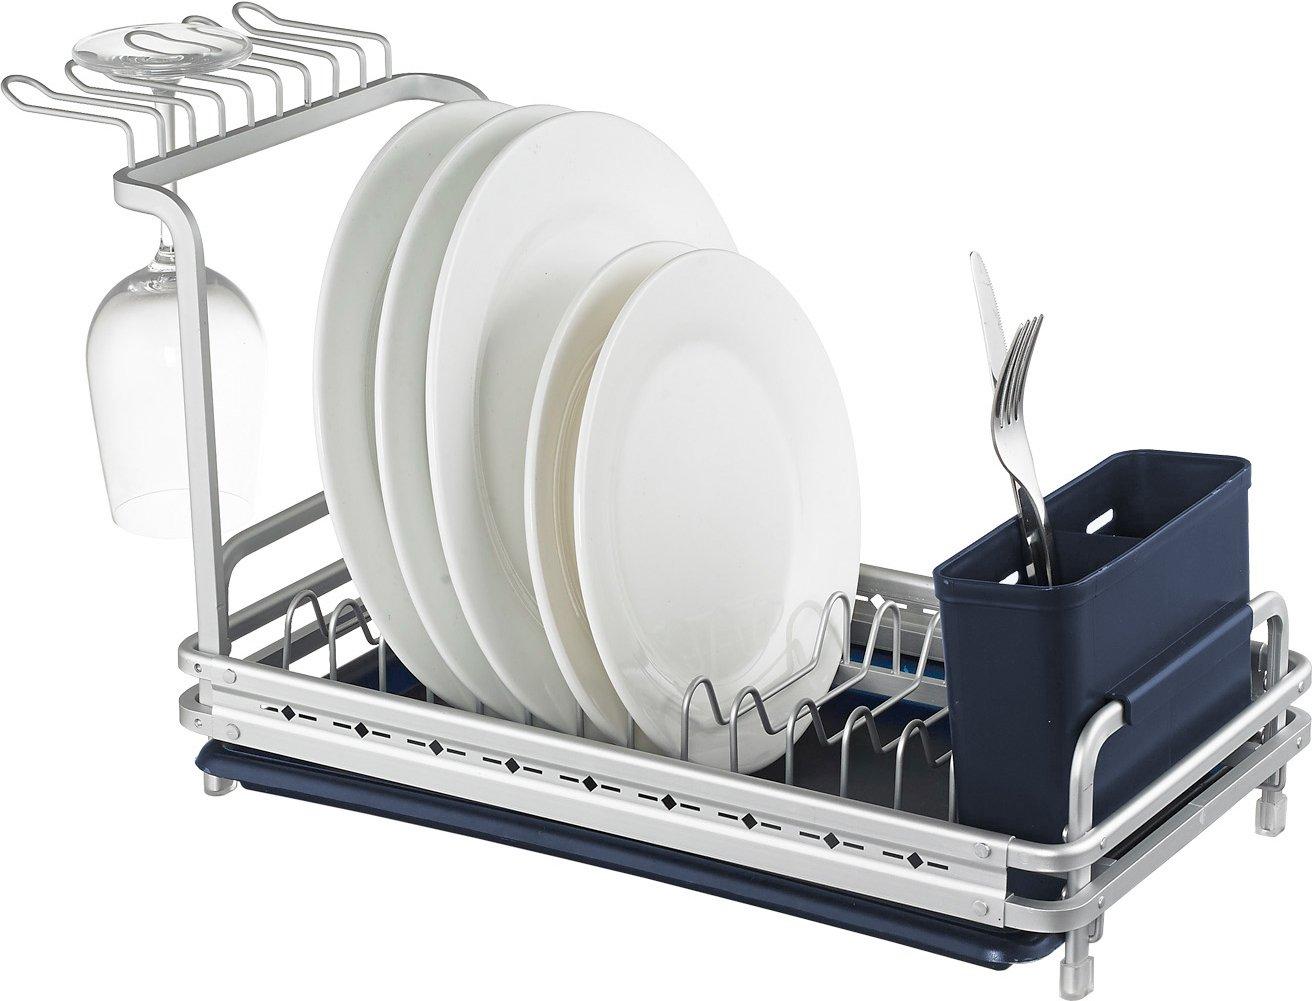 Amazon: Surpahs Aluminum Small Dish Drying Rack, Never Rust: Kitchen &  Dining